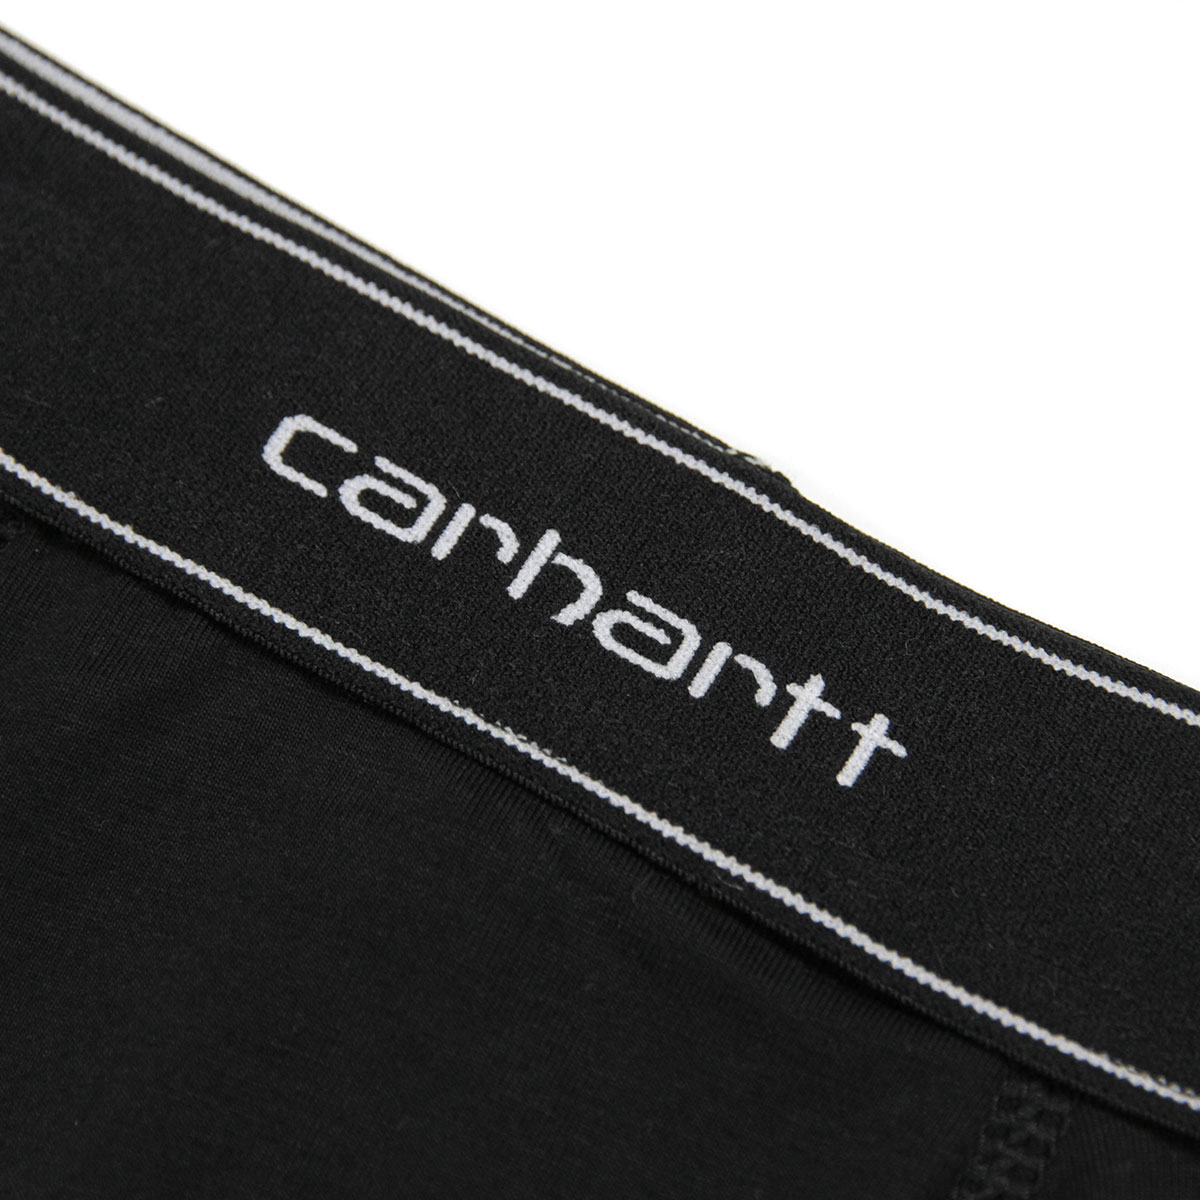 carhartt_wip_2